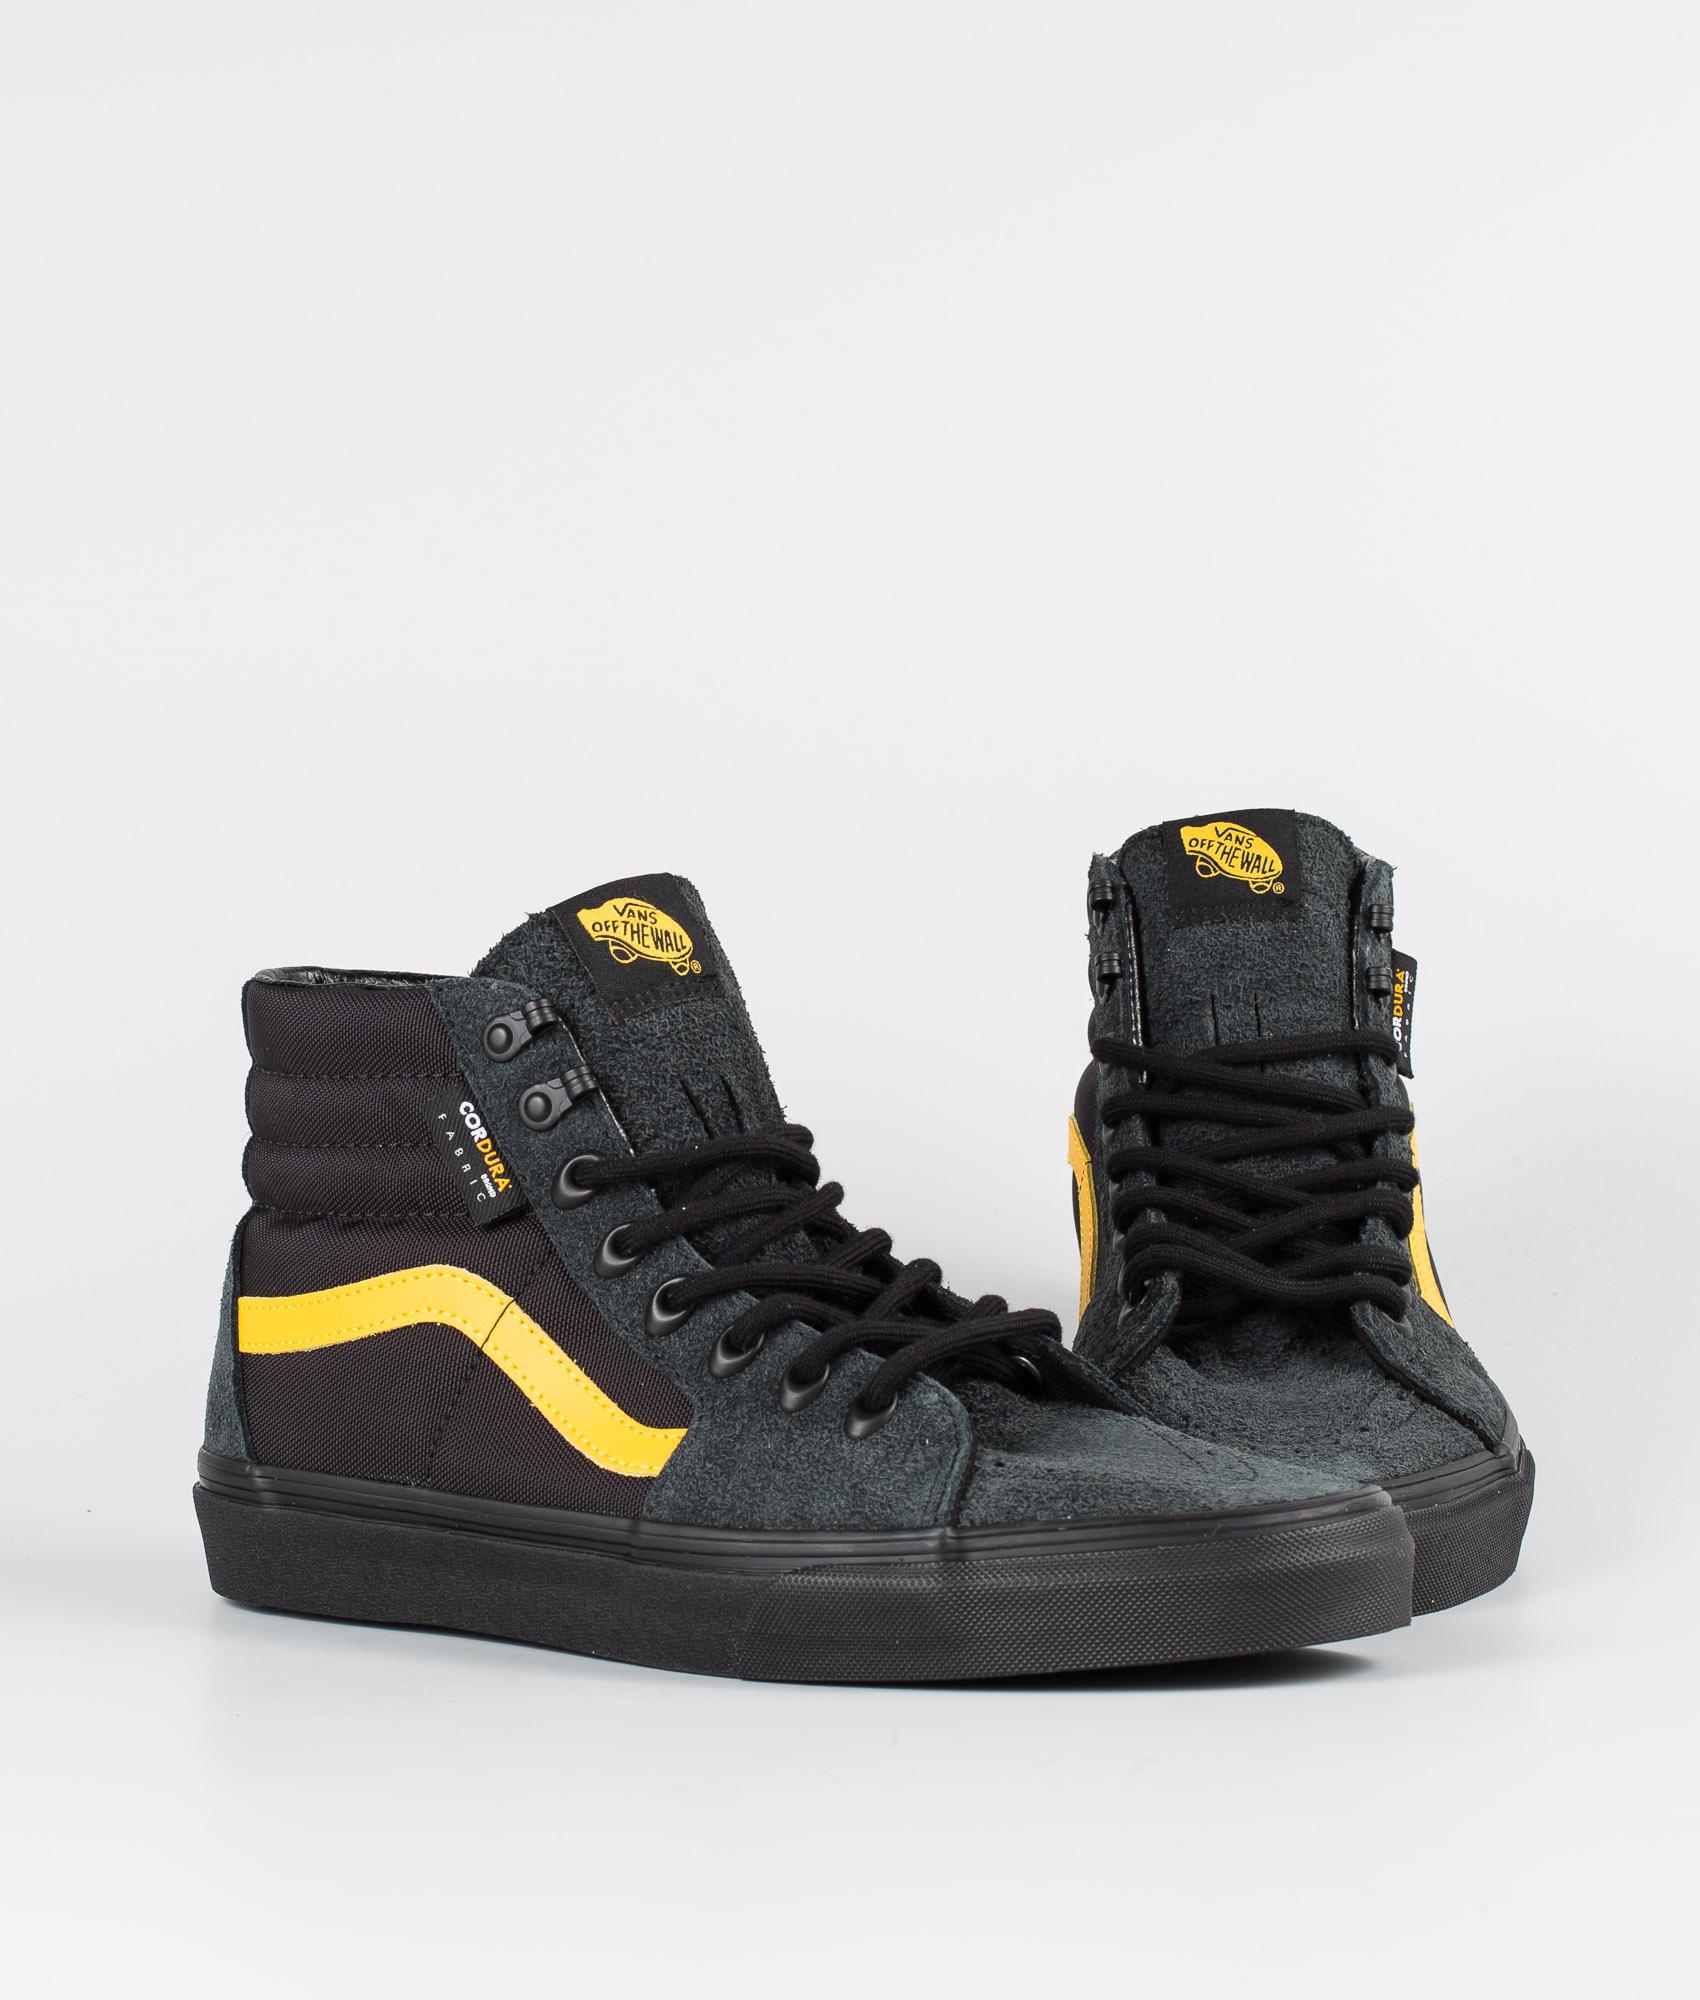 Vans Sk8 Hi Skor (Cordura) Black